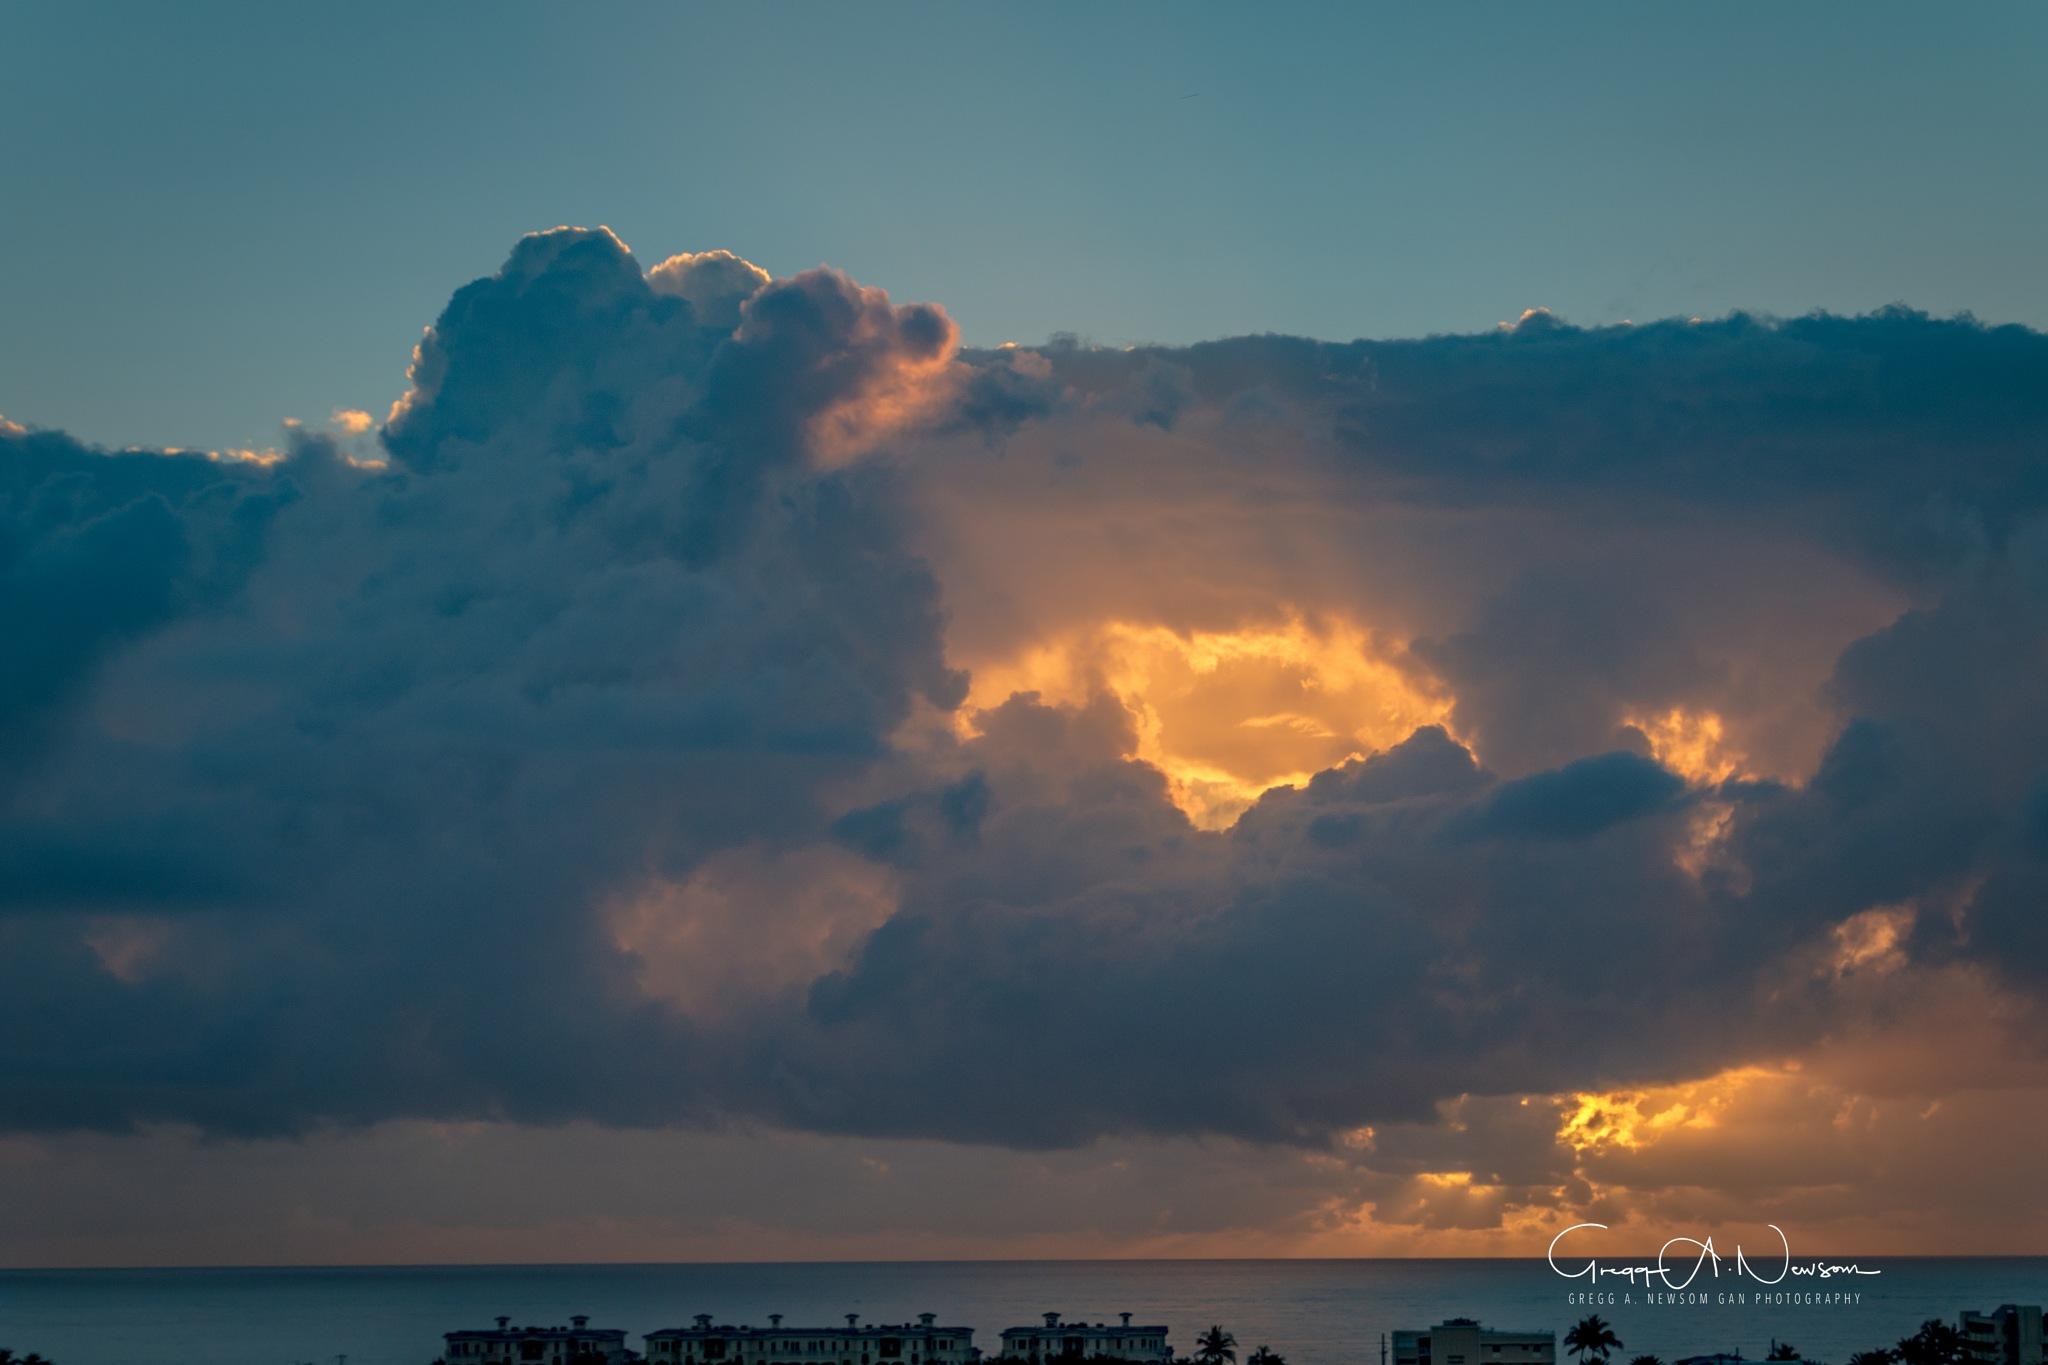 Morning by Gnewsom324